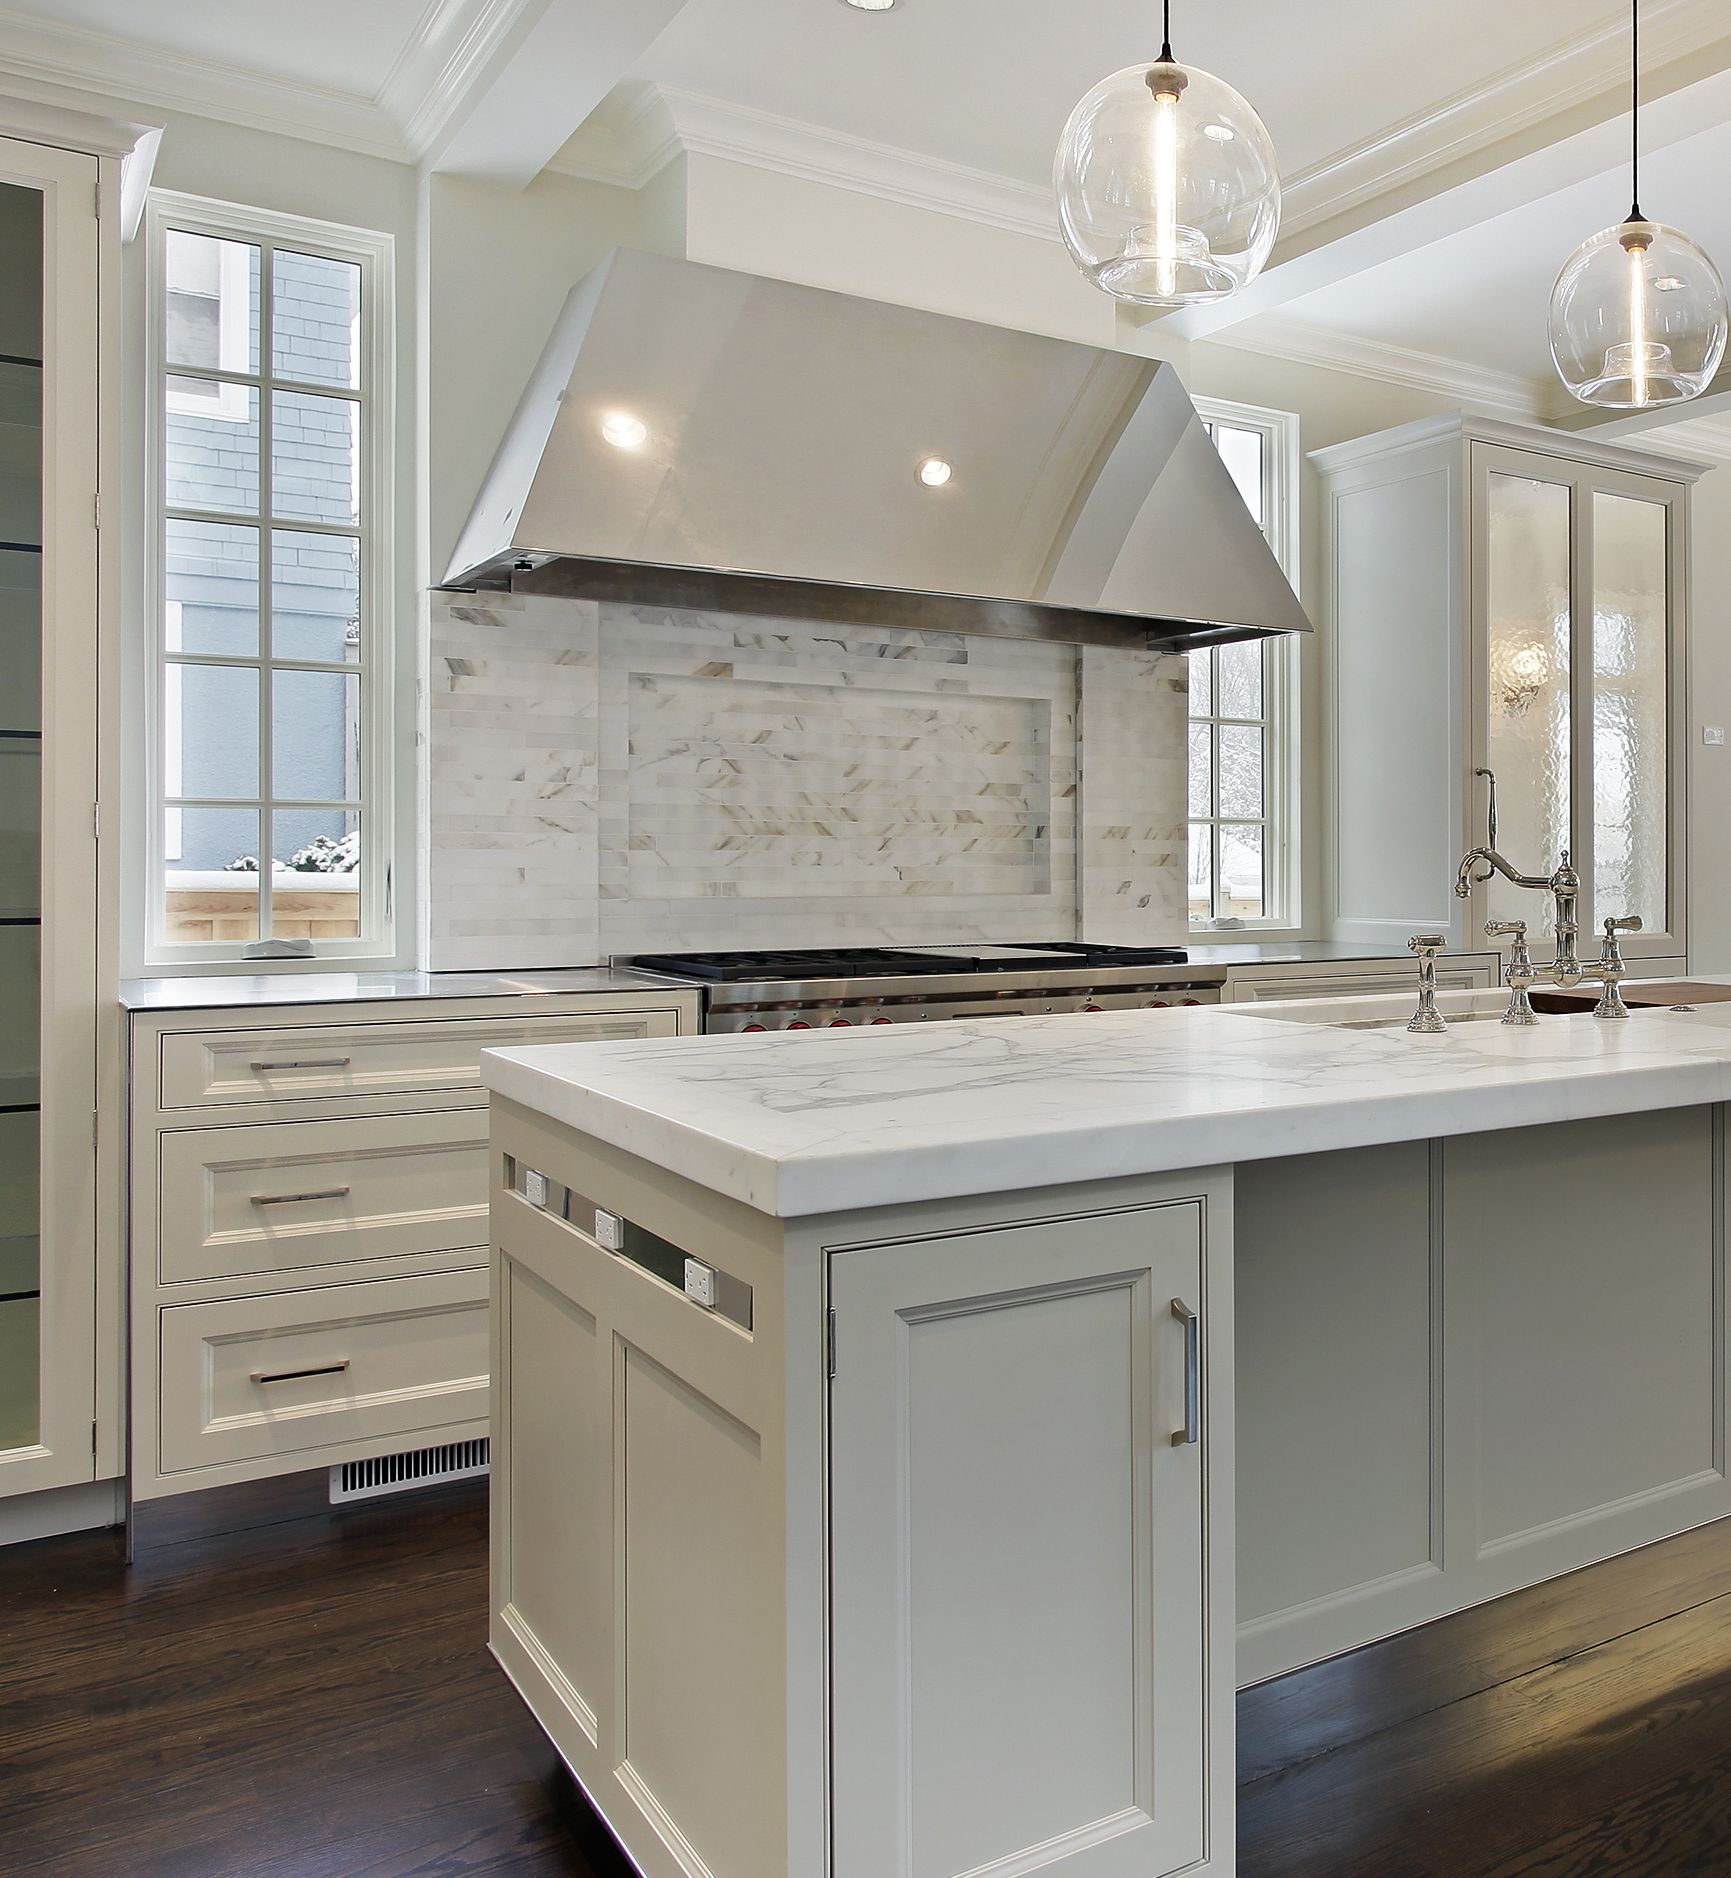 Prasada Kitchens And Fine Cabinetry: White Kitchen With Grey Island